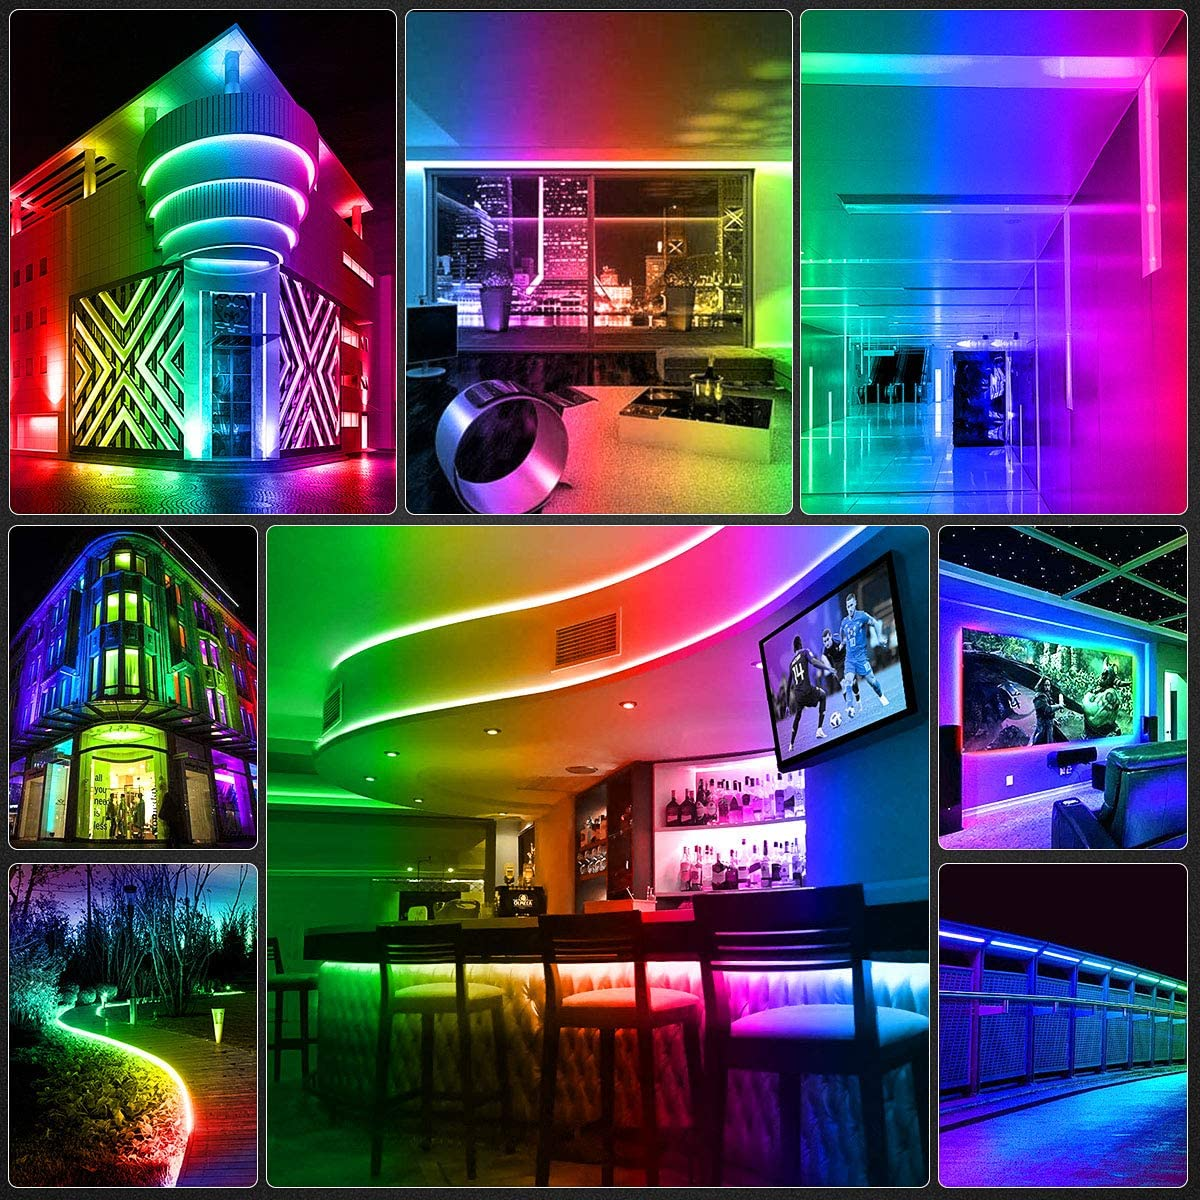 Support Arduino Raspberry Pi Arkare Addressable RGB LED Strip WS2812B Programmable Dream Color Digital LED Pixels Ribbon Light 3.3ft 144 LEDs 5V DC Waterproof IP67 Black FPCB No Power//Controller